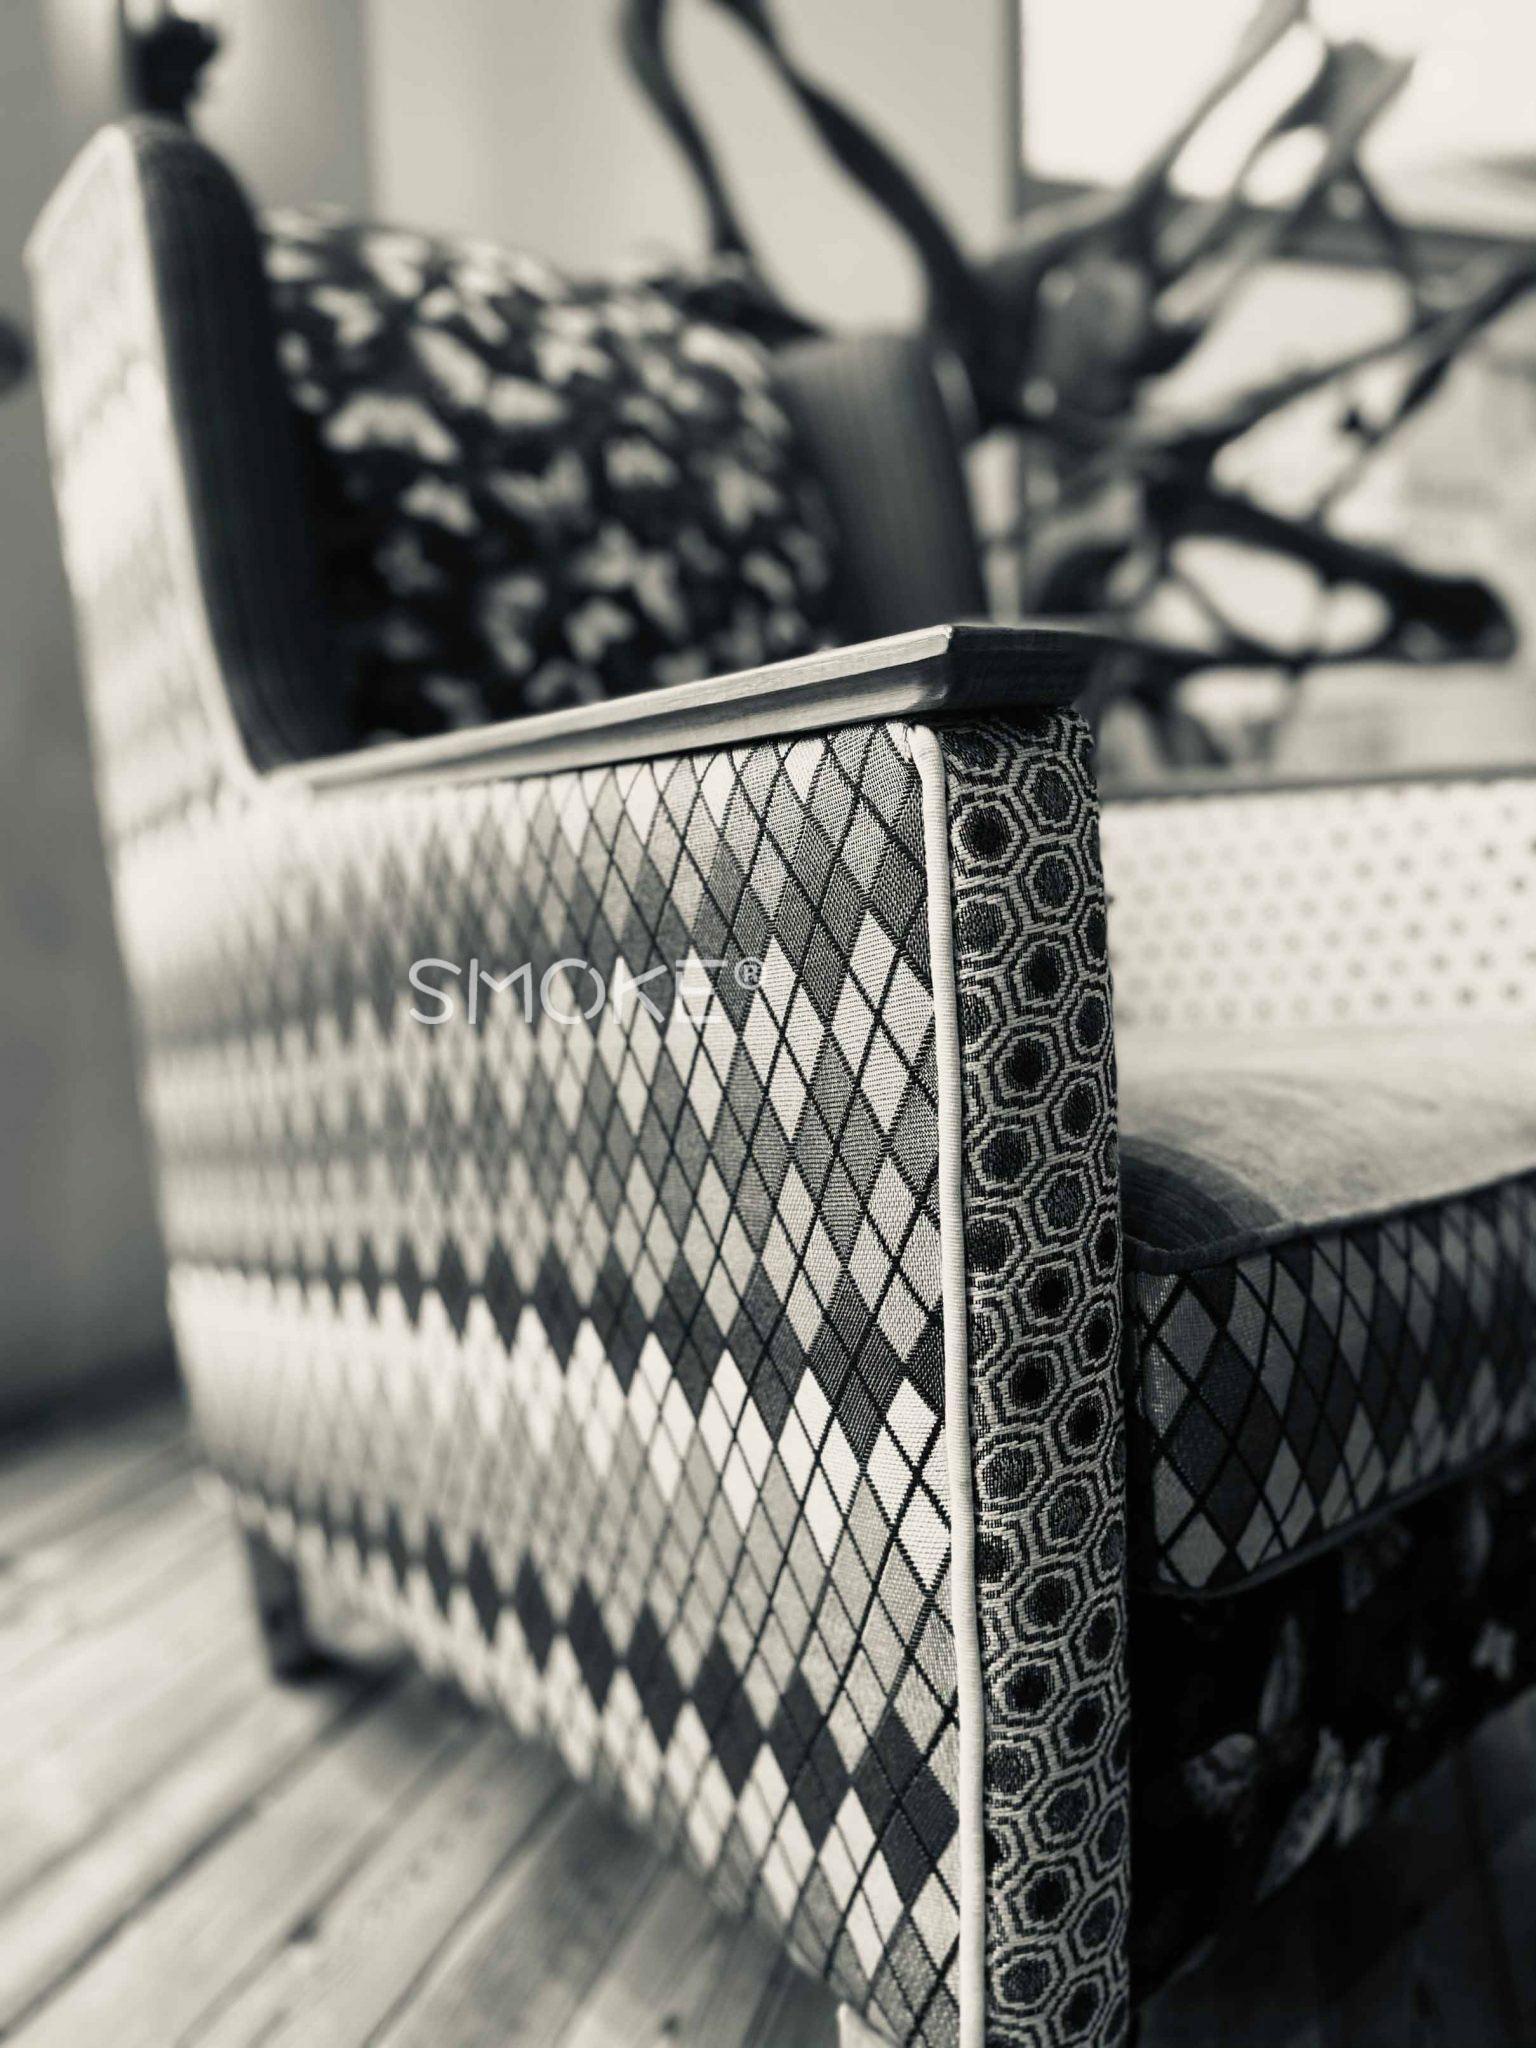 Karin armchair smoke with watermark